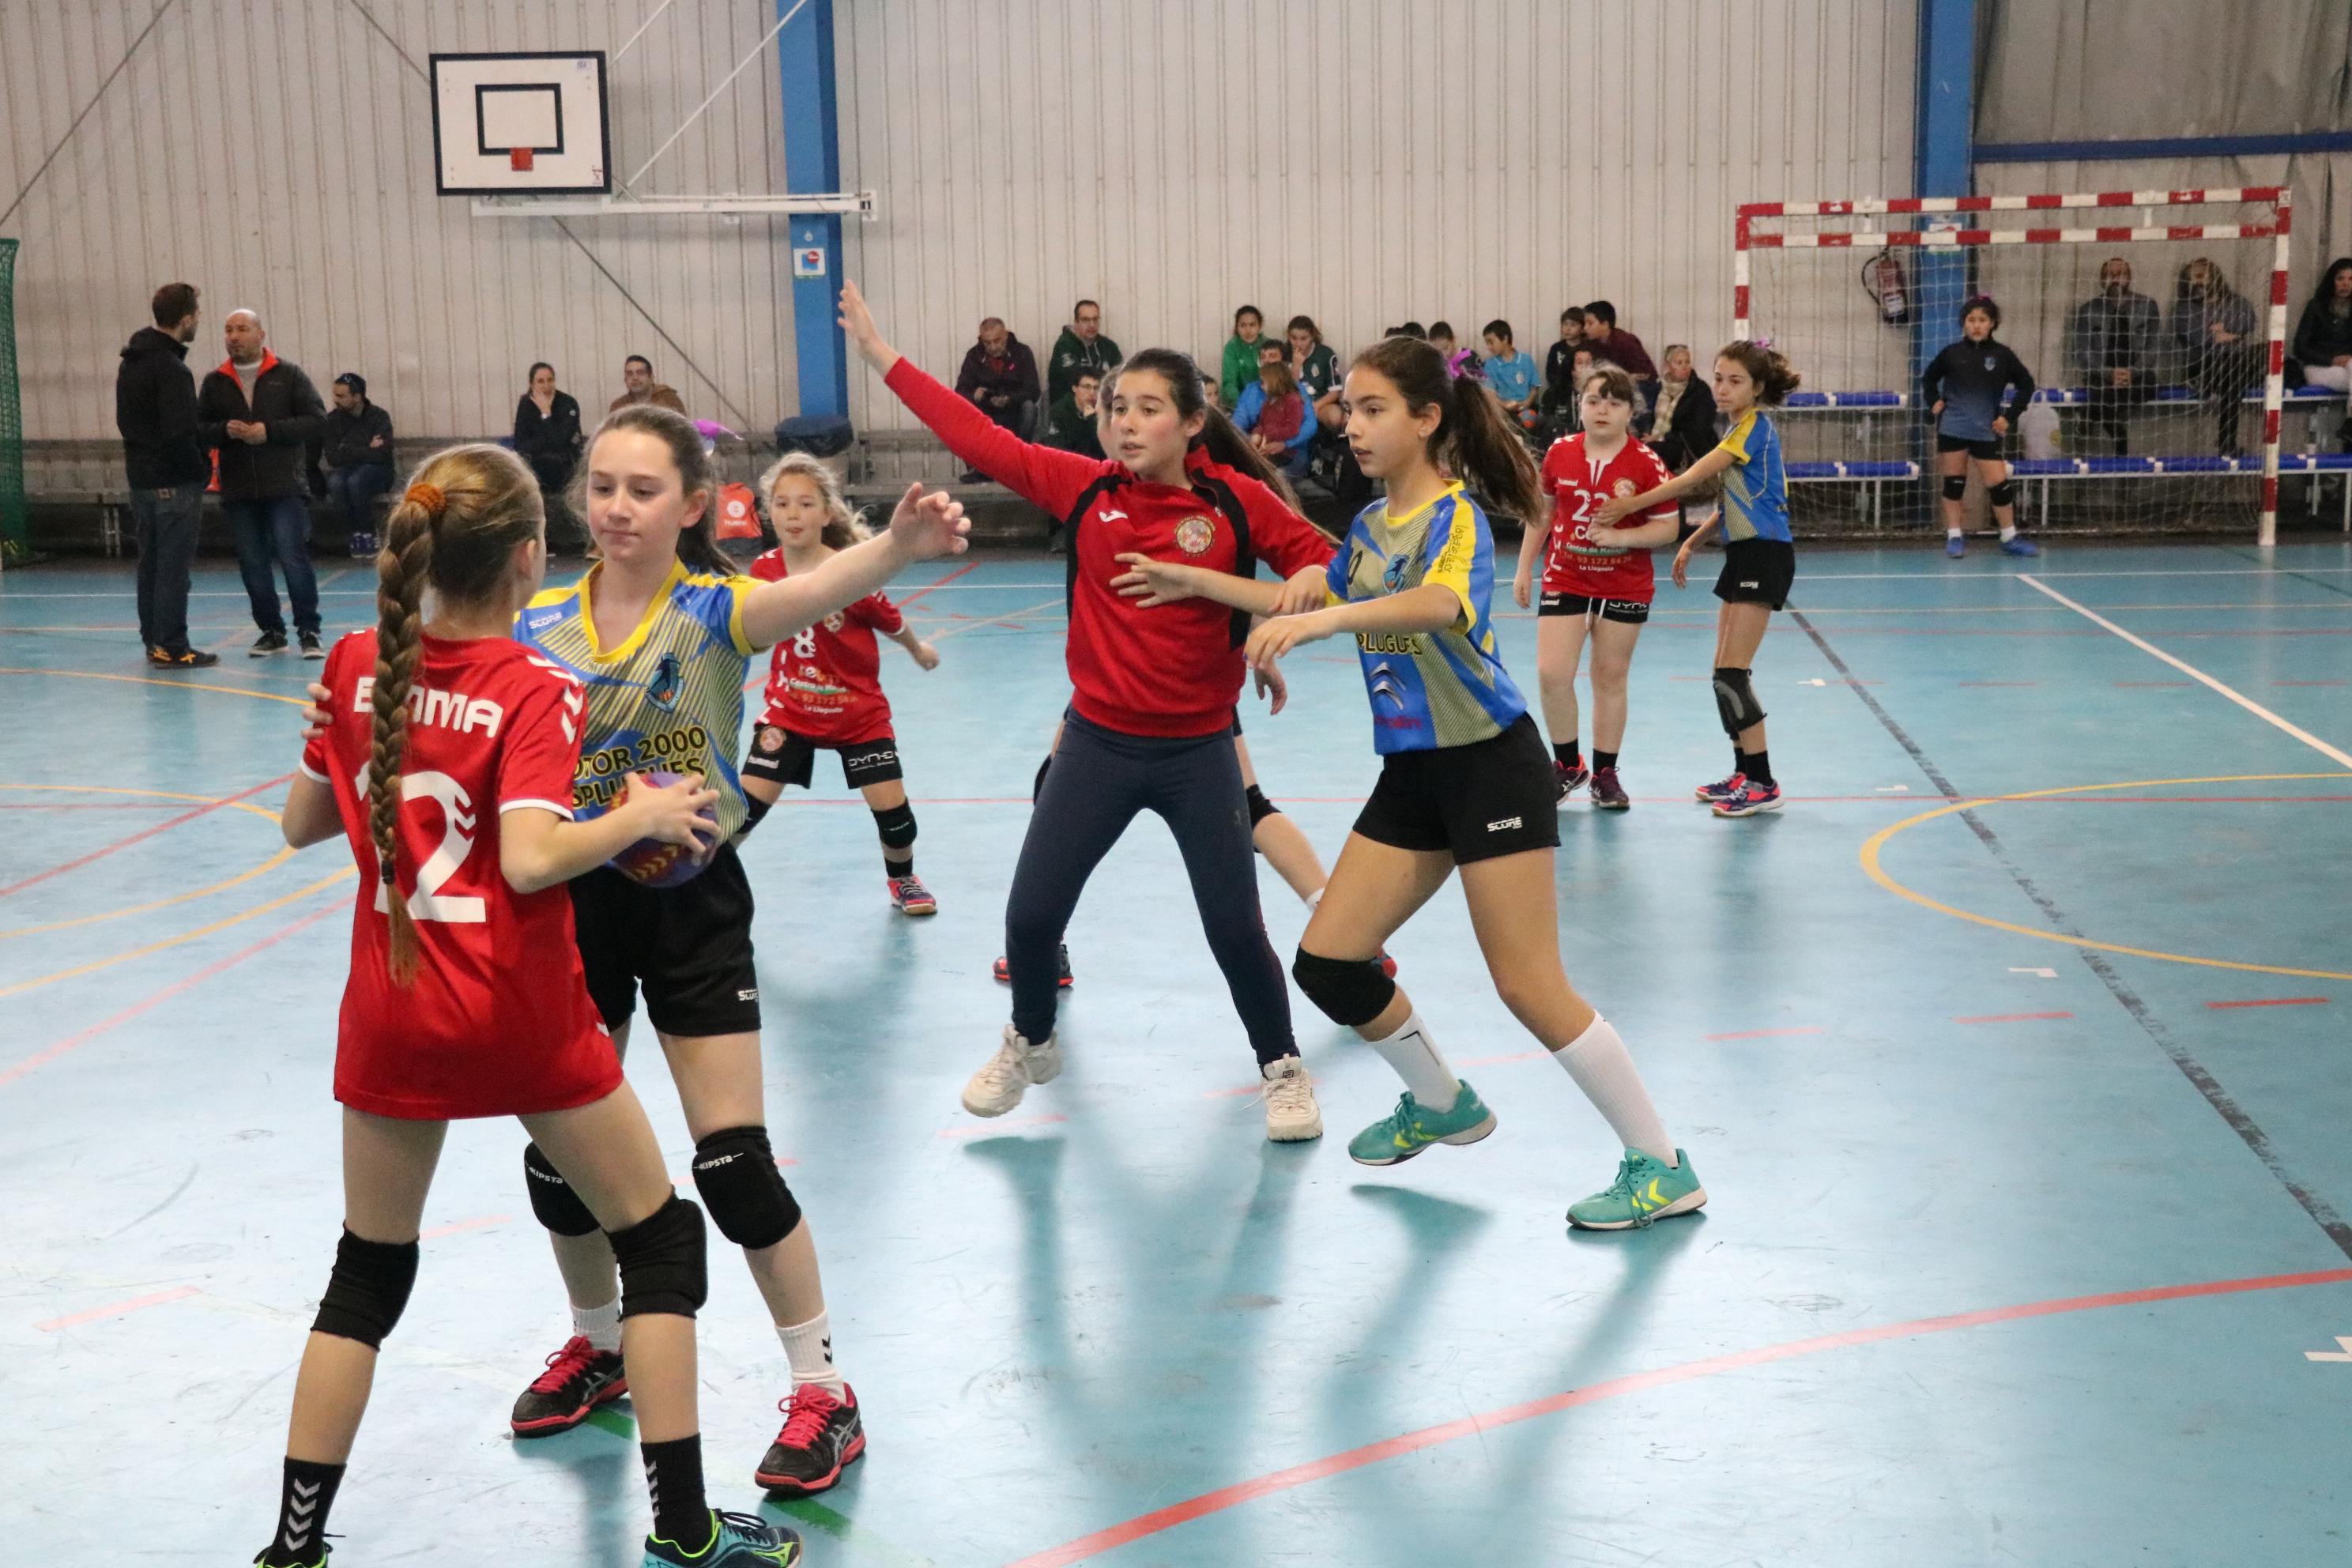 El Joventut Handbol i el FS Unión Llagostense se sumen al Dia de les Dones